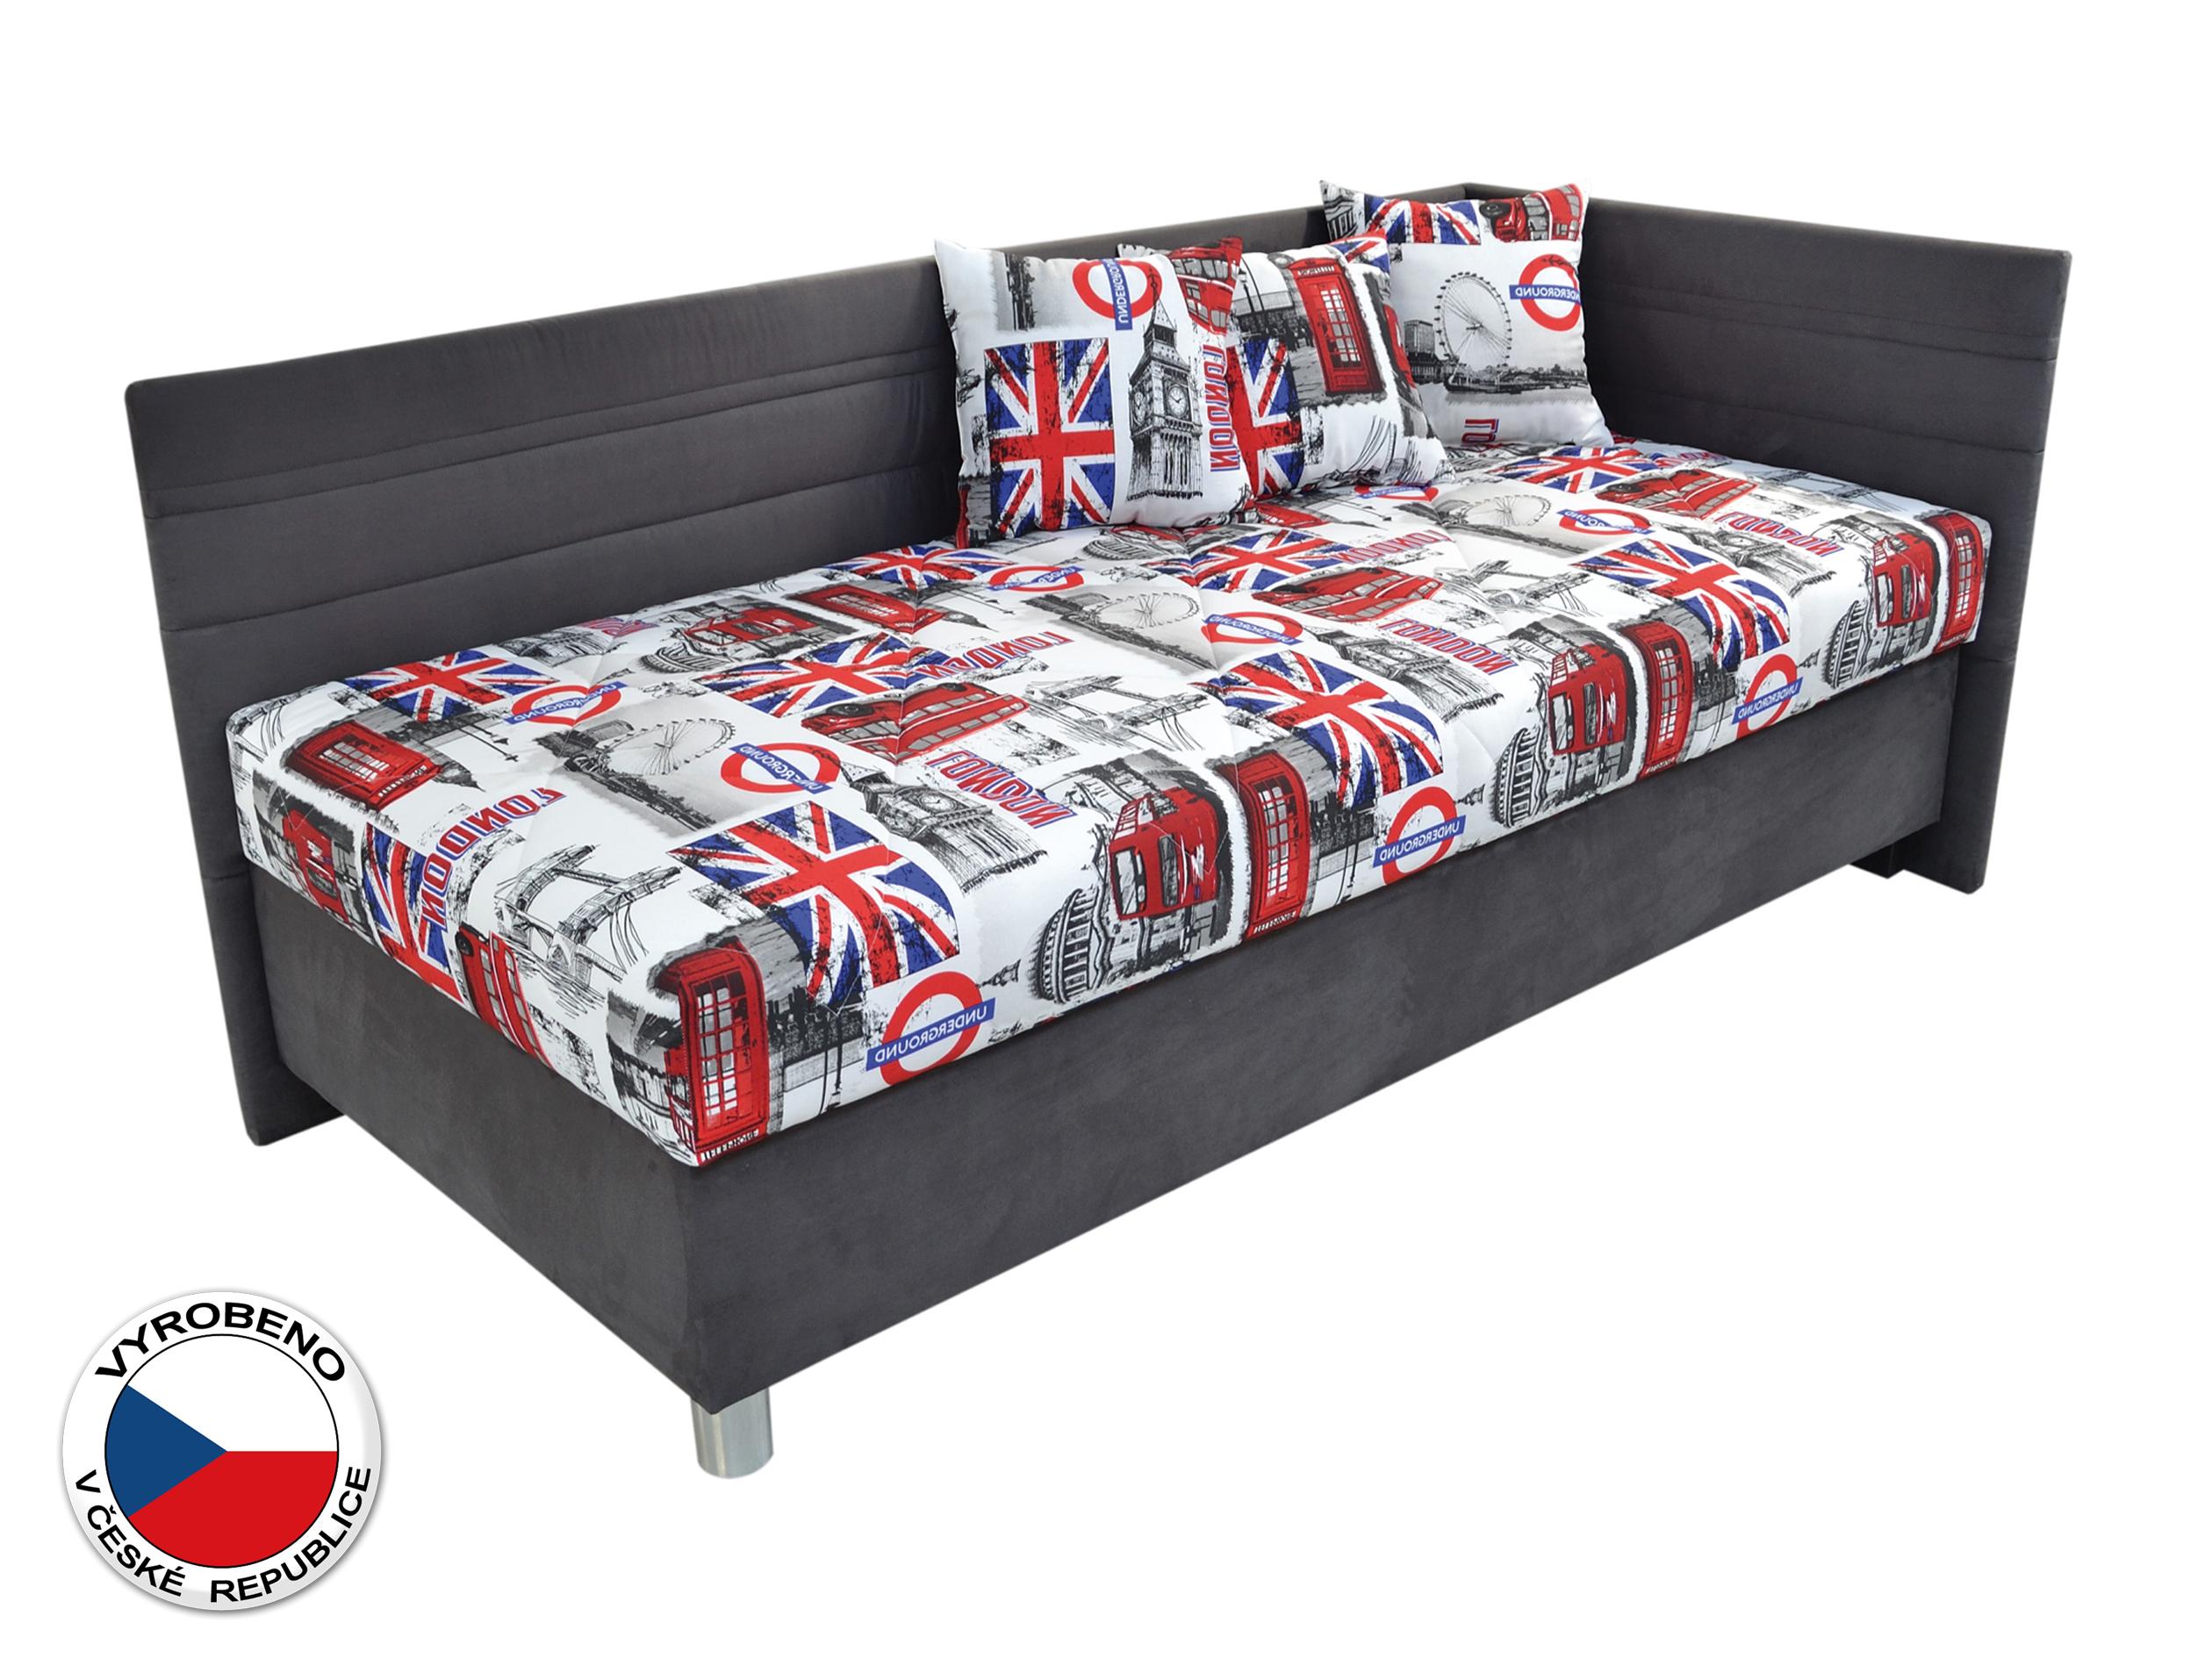 Jednolůžková postel 90 cm - Blanář - Polly (bílá + šedá) (s roštem a matrací) (P)